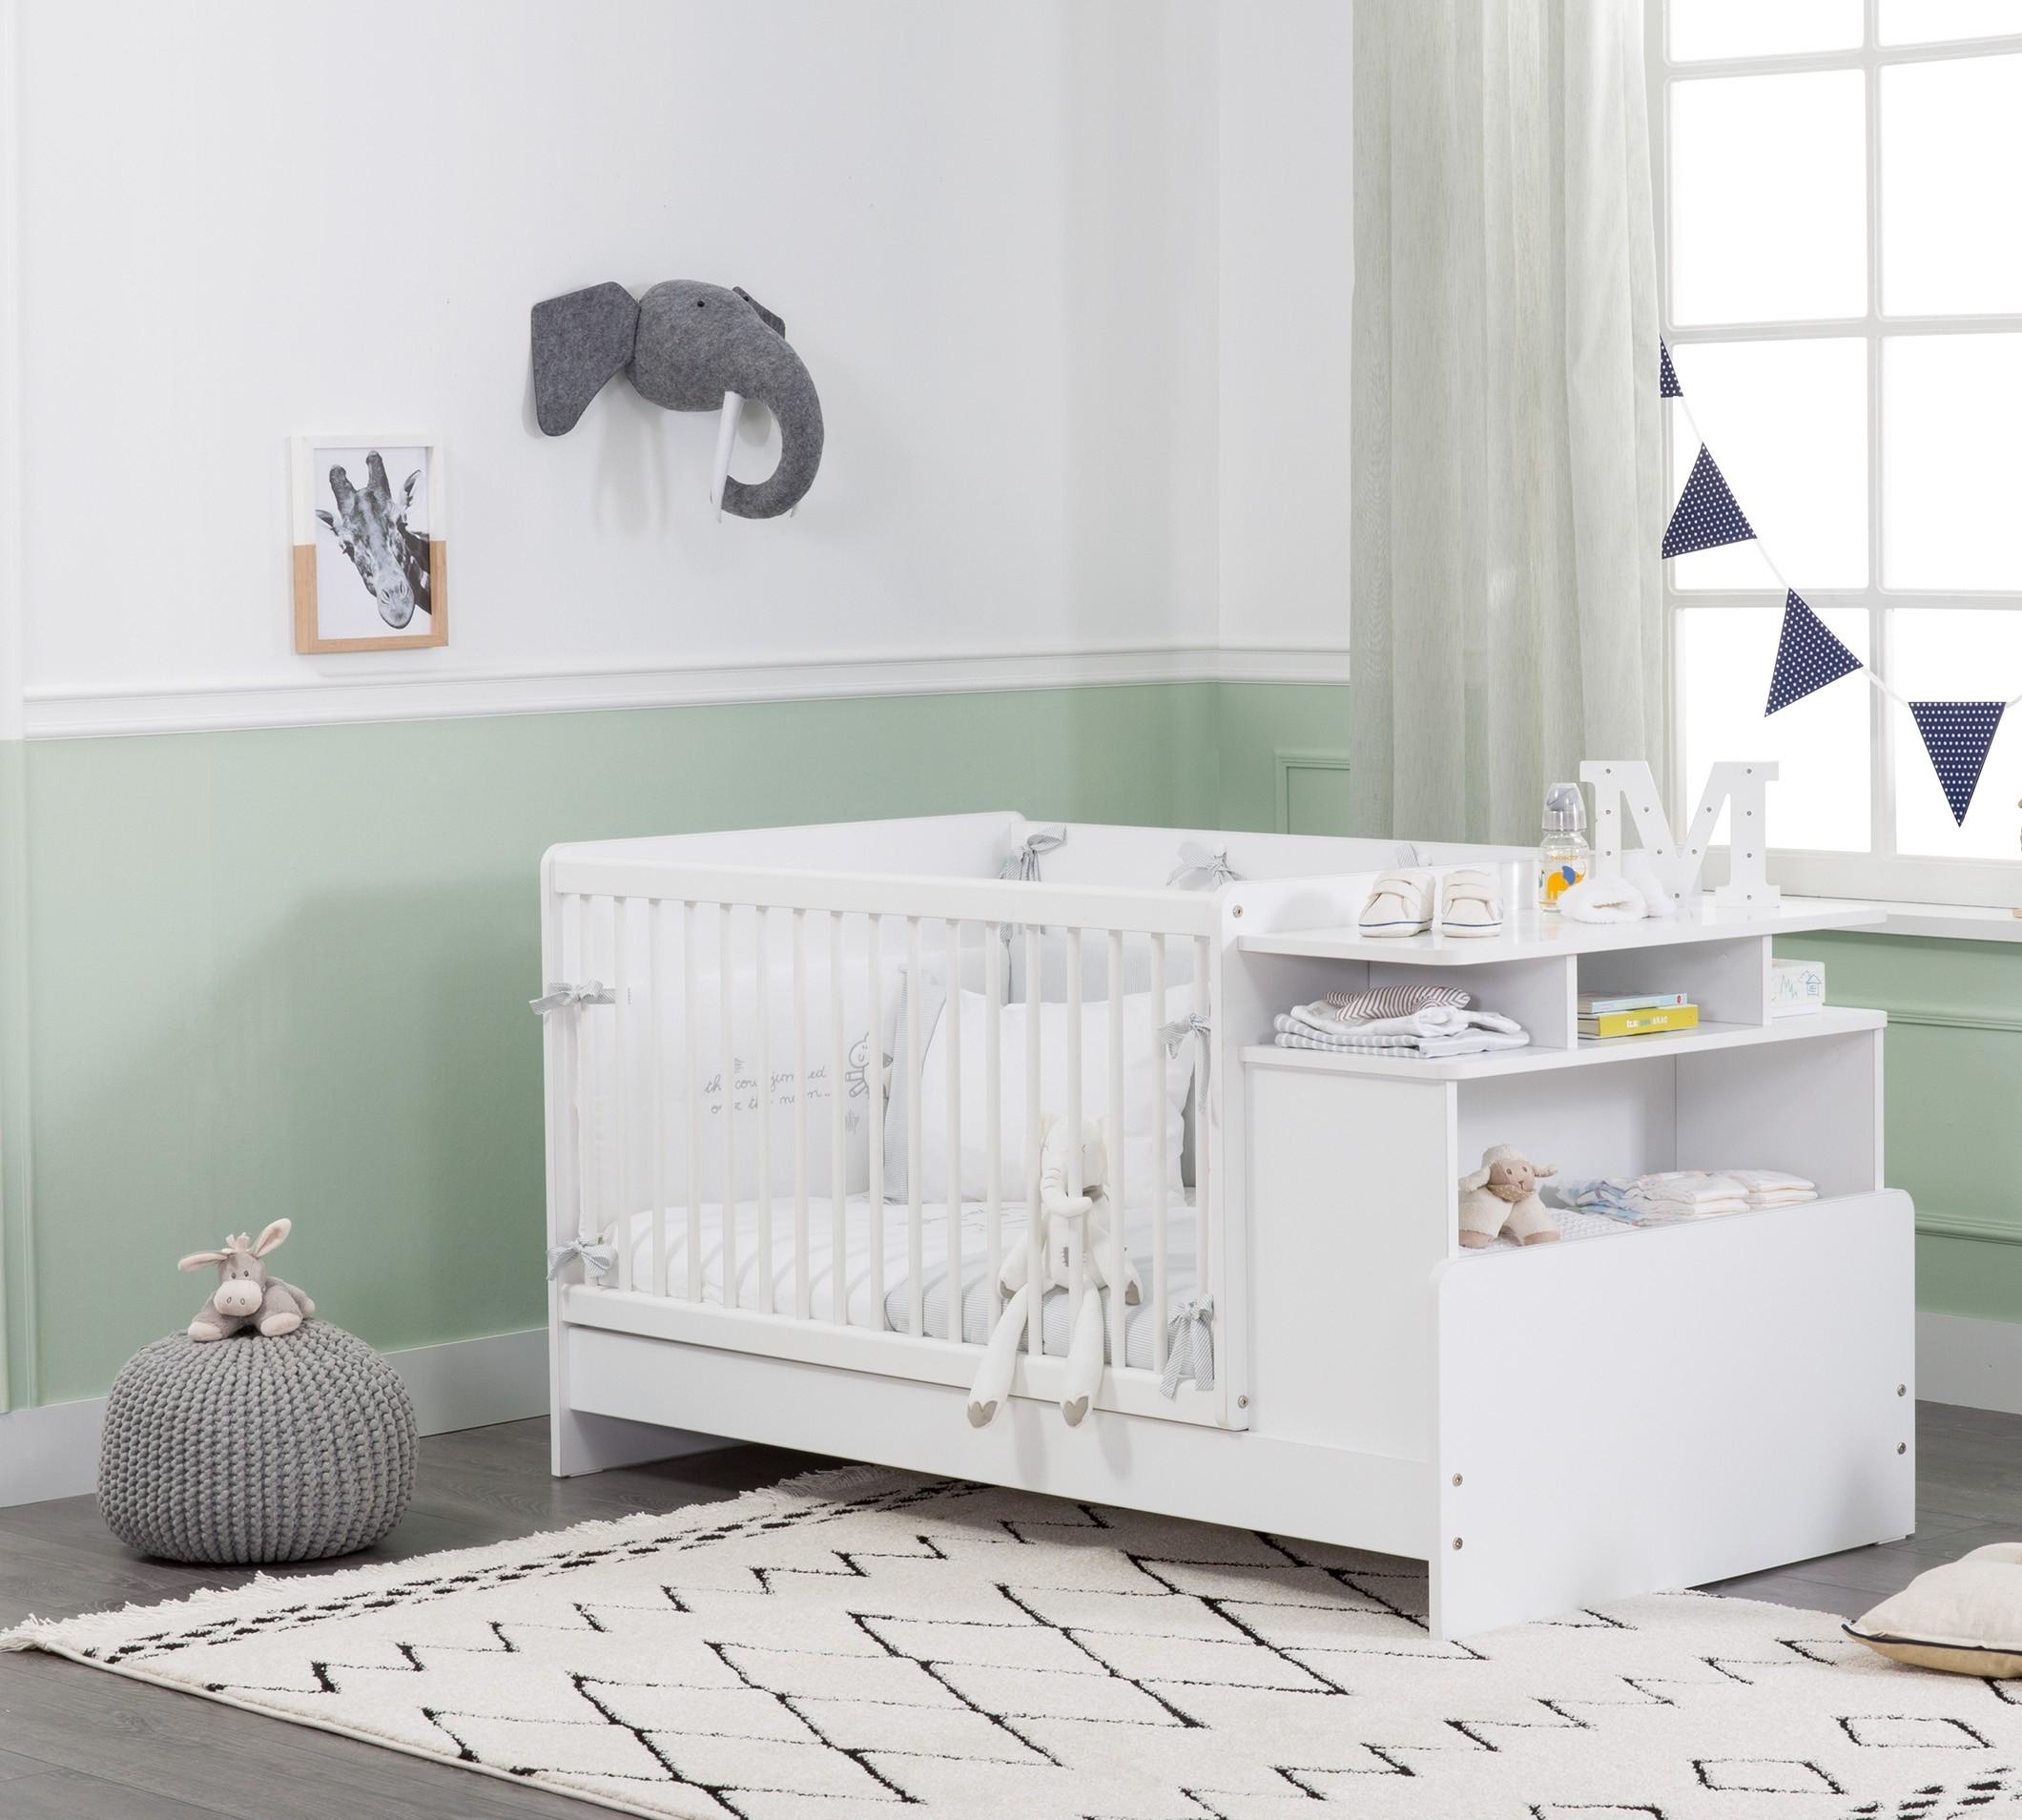 Patut transformabil din pal, pentru bebe Masali Baby Alb, 110 x 70 cm somproduct.ro